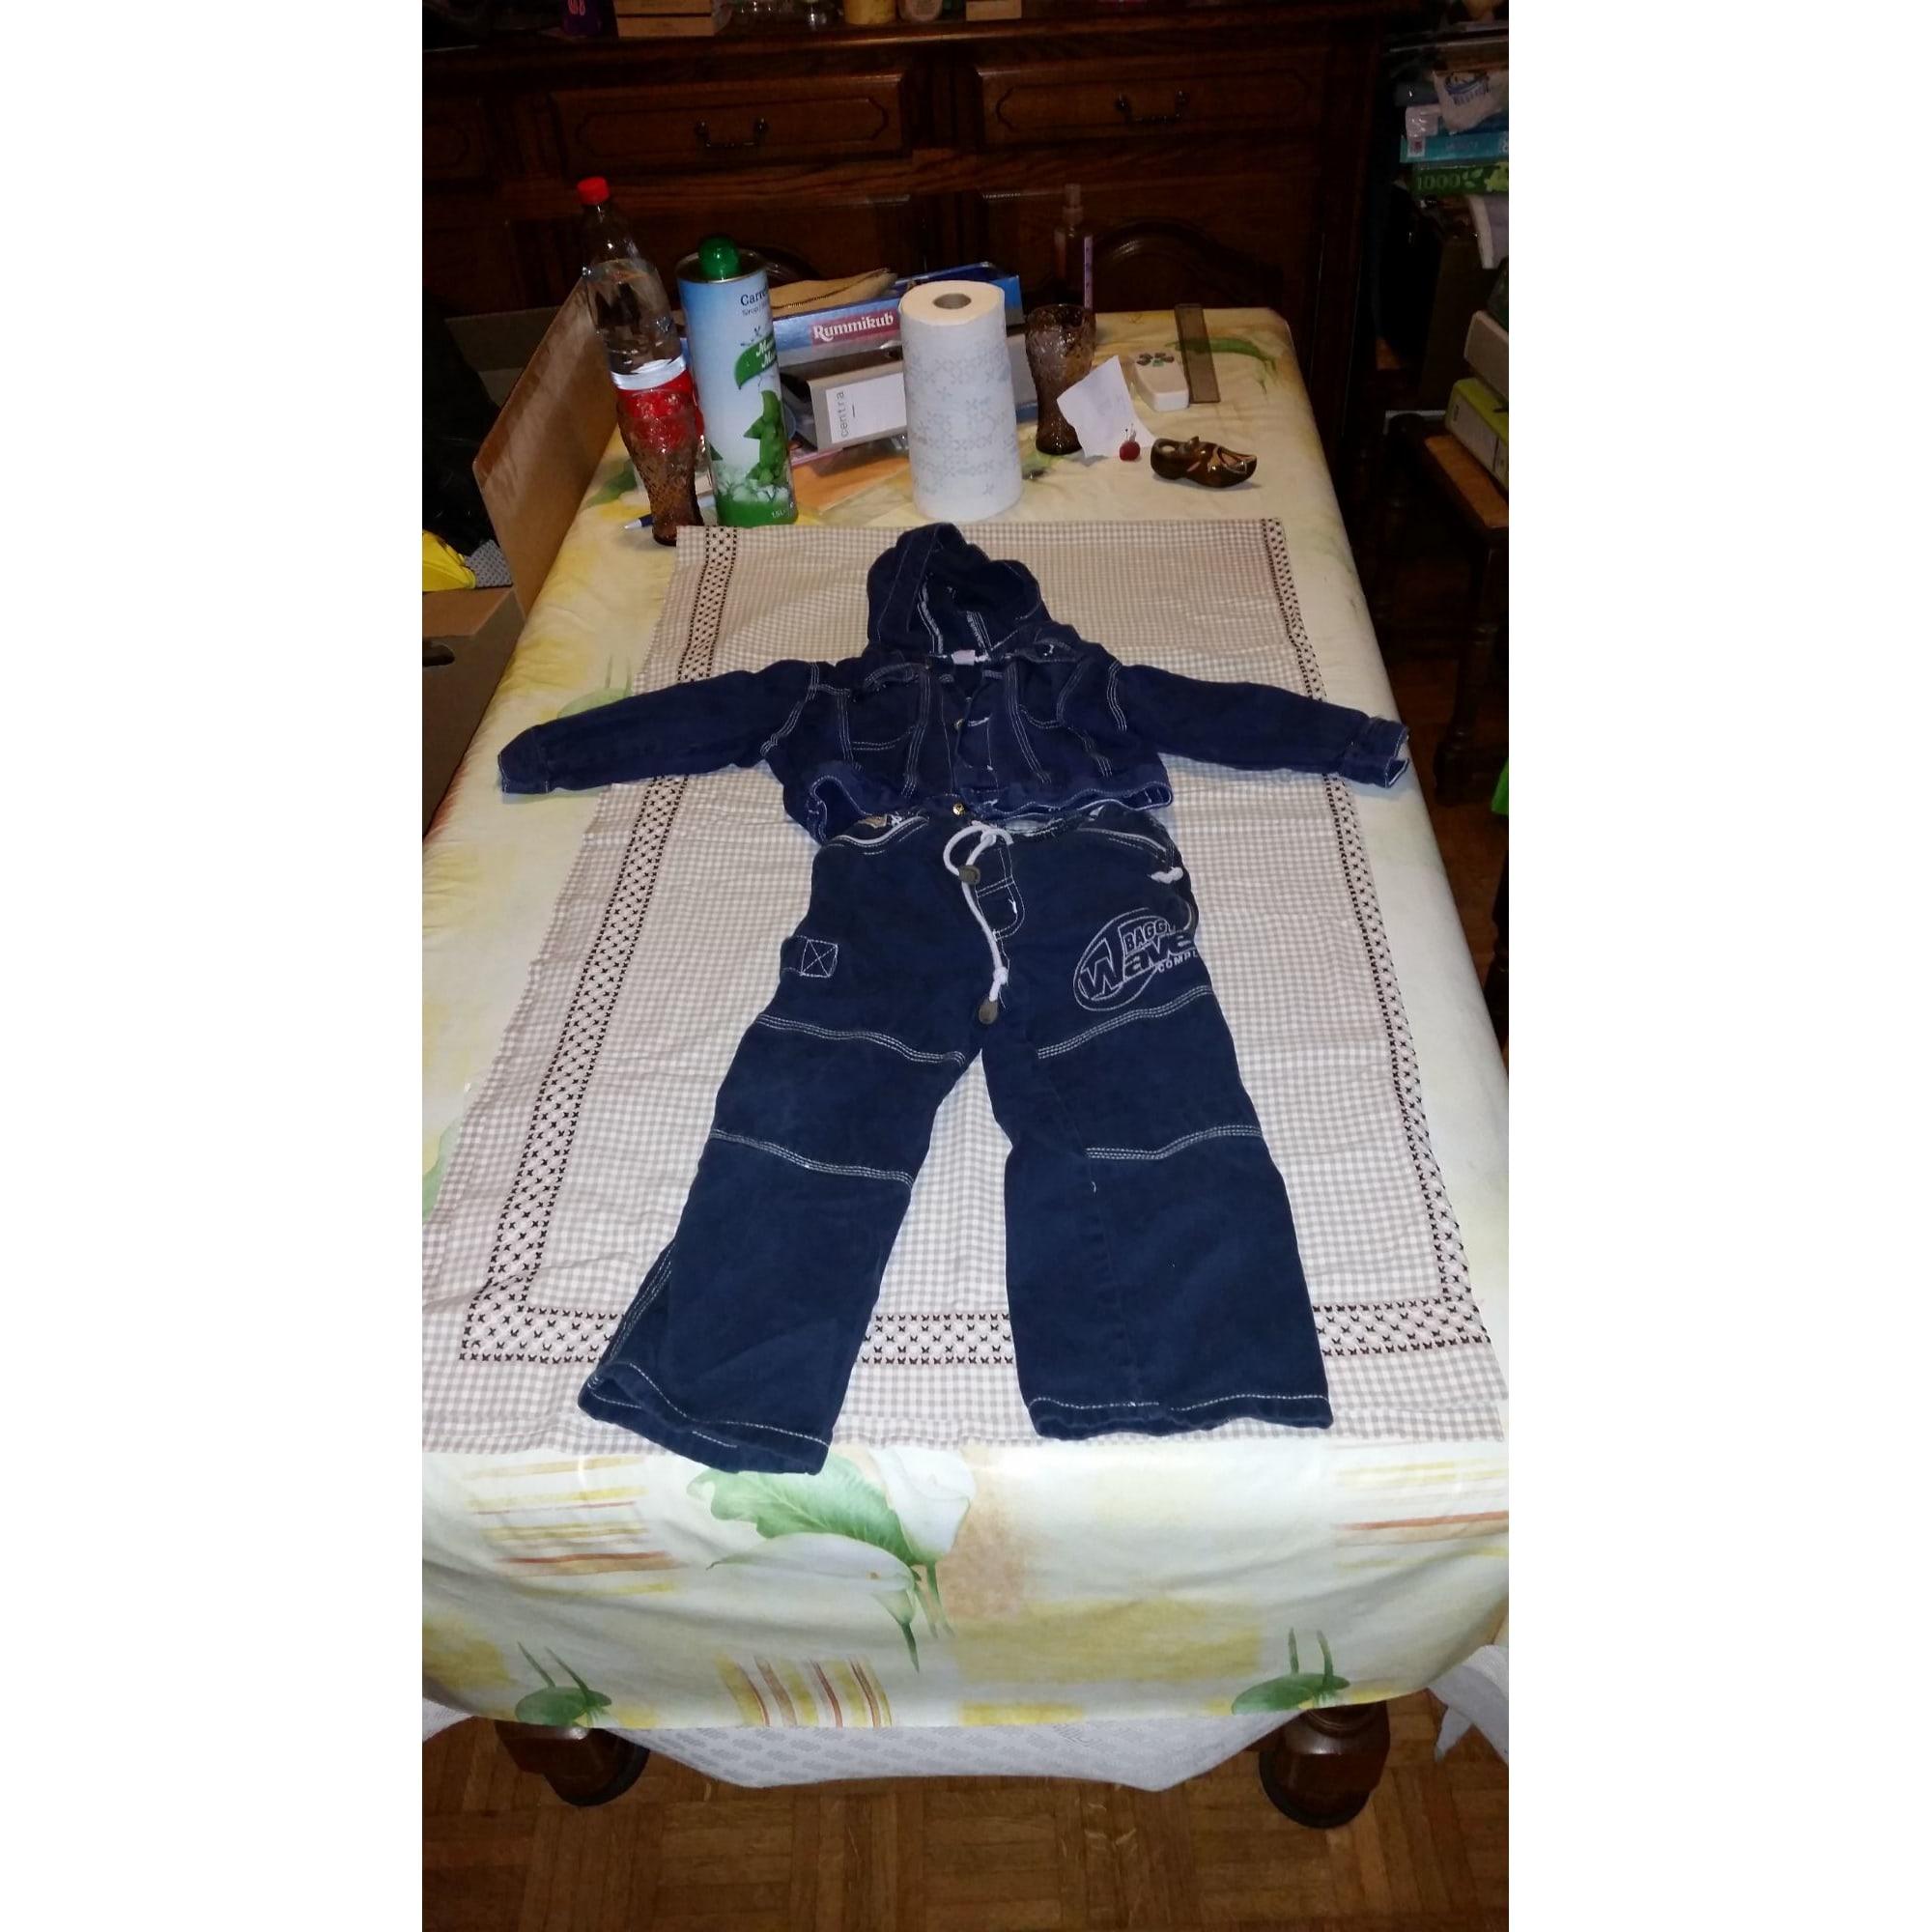 Pants Set, Outfit MARQUE INCONNUE Blue, navy, turquoise